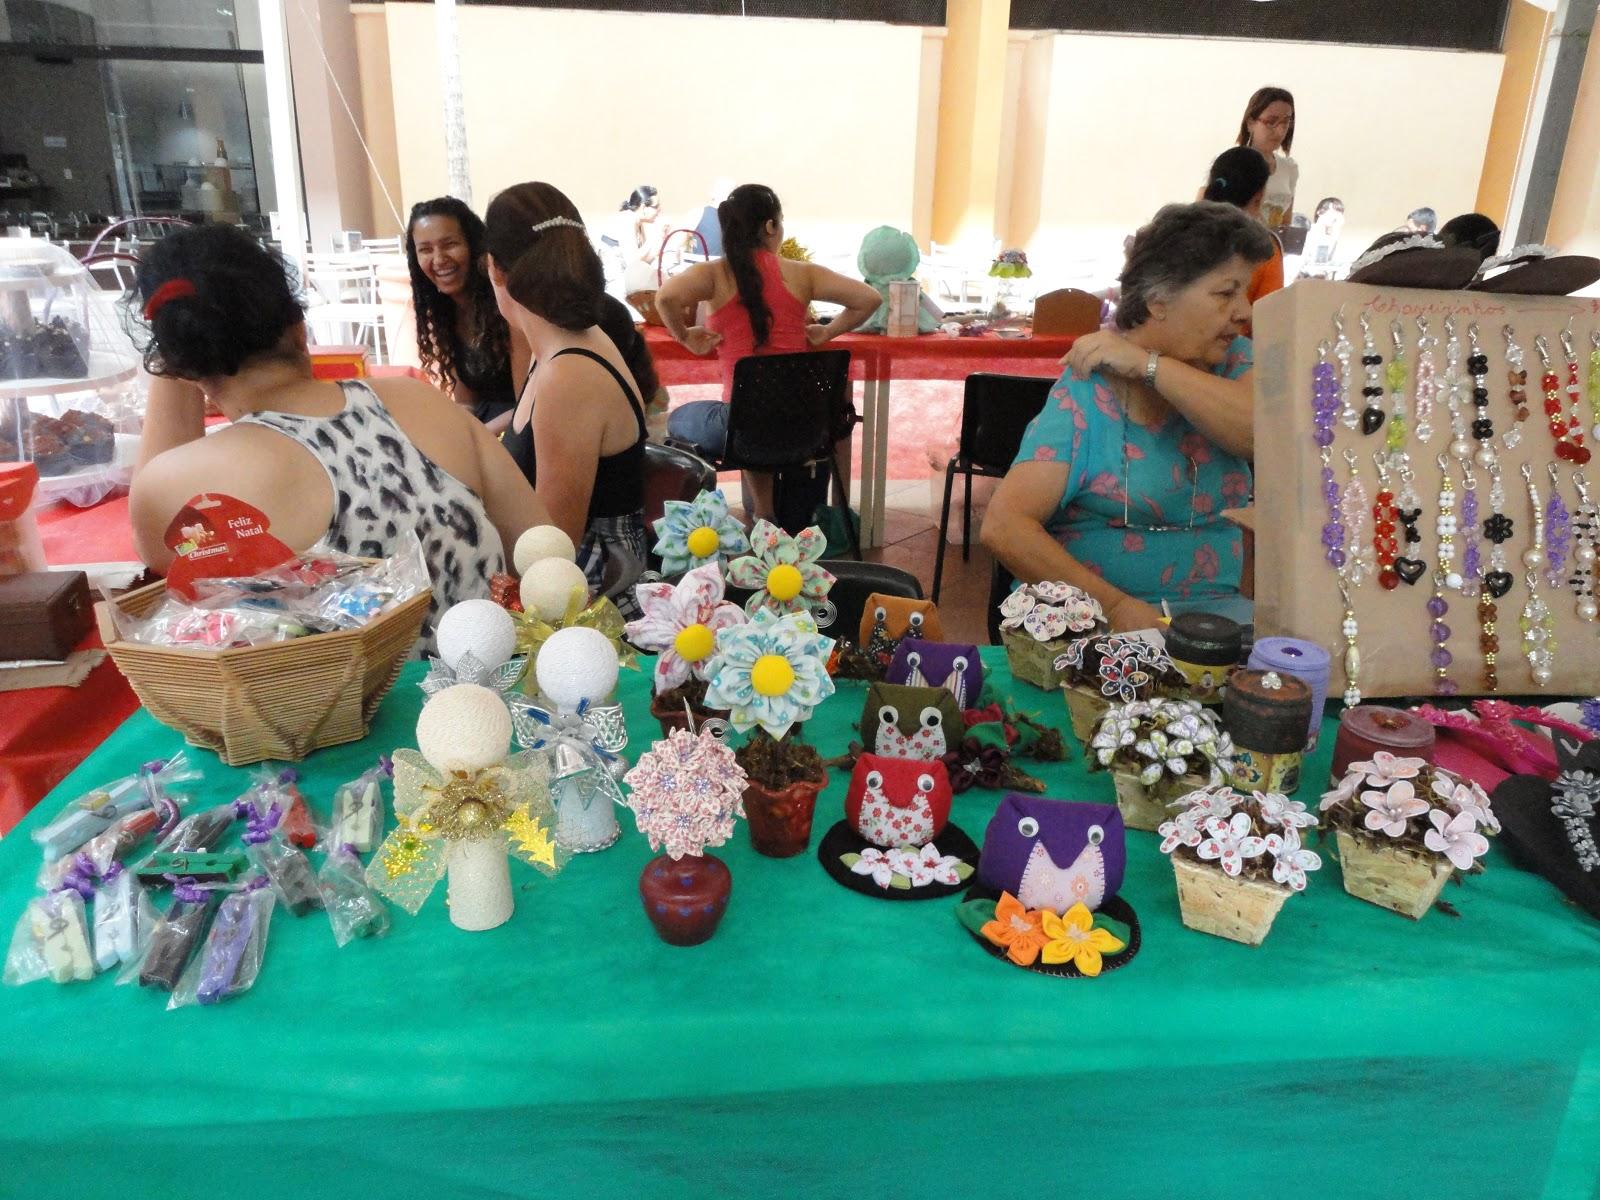 Armario Resina Carrefour ~ Janela de Artes !!!! Feira de Artesanato Prefeitura de